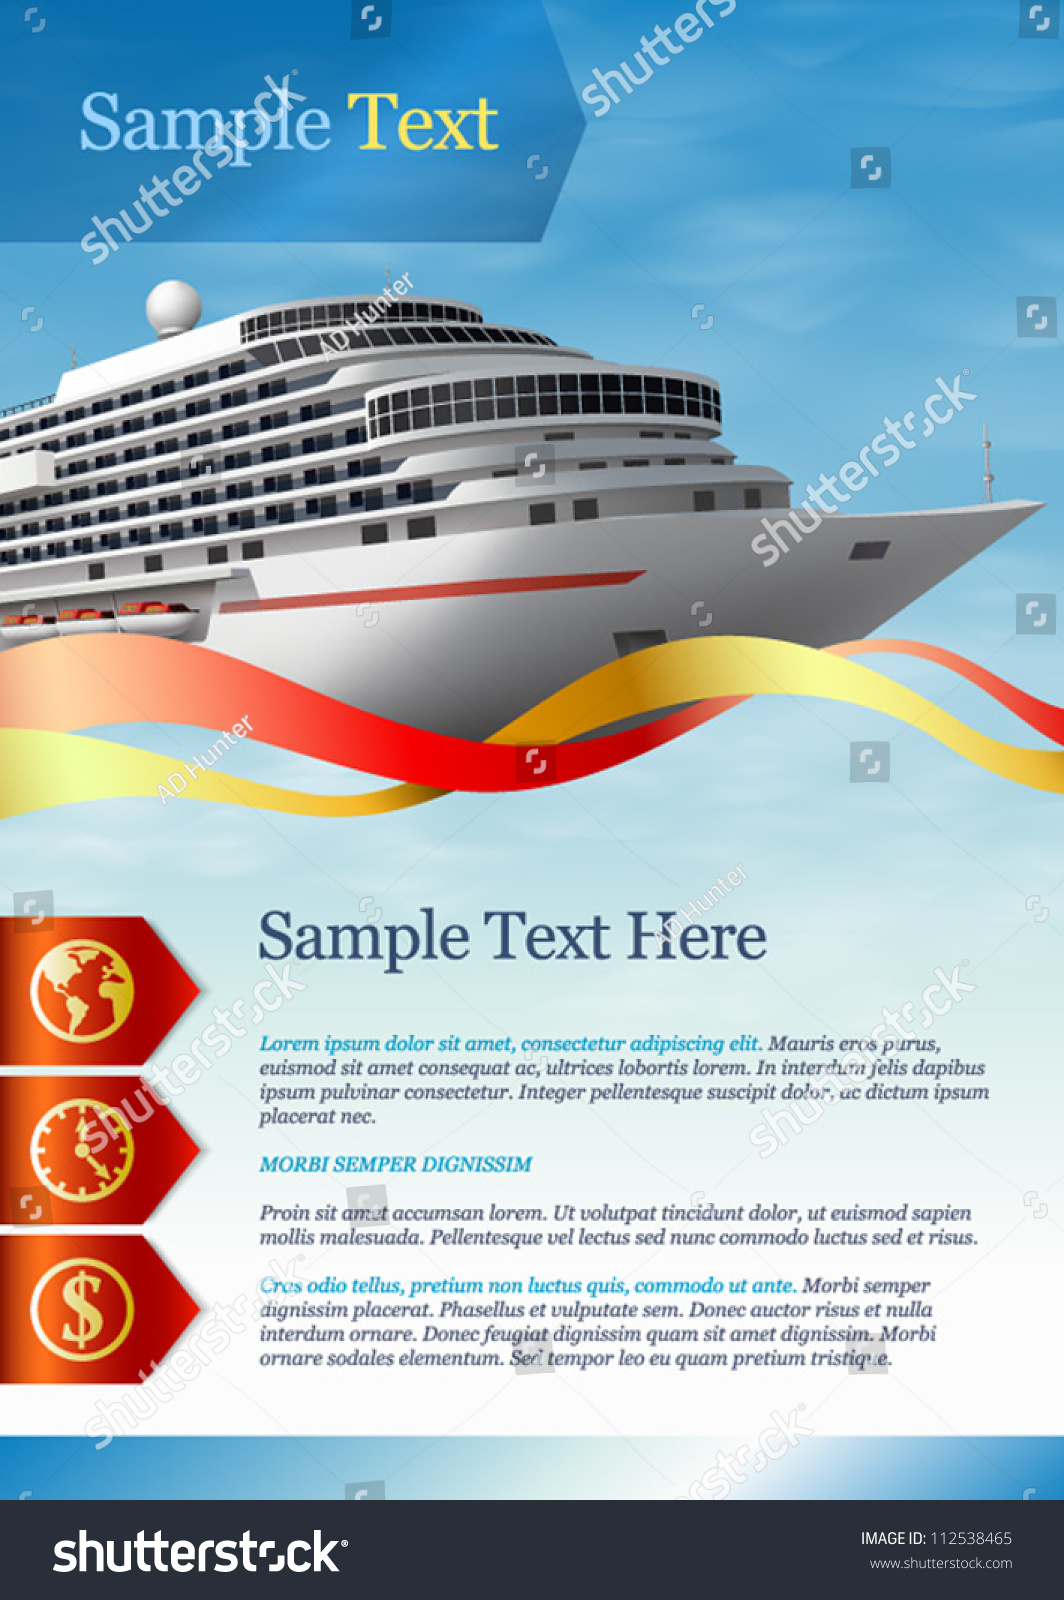 cruise ship brochure templates - template advertising cruise liner stock vector 112538465